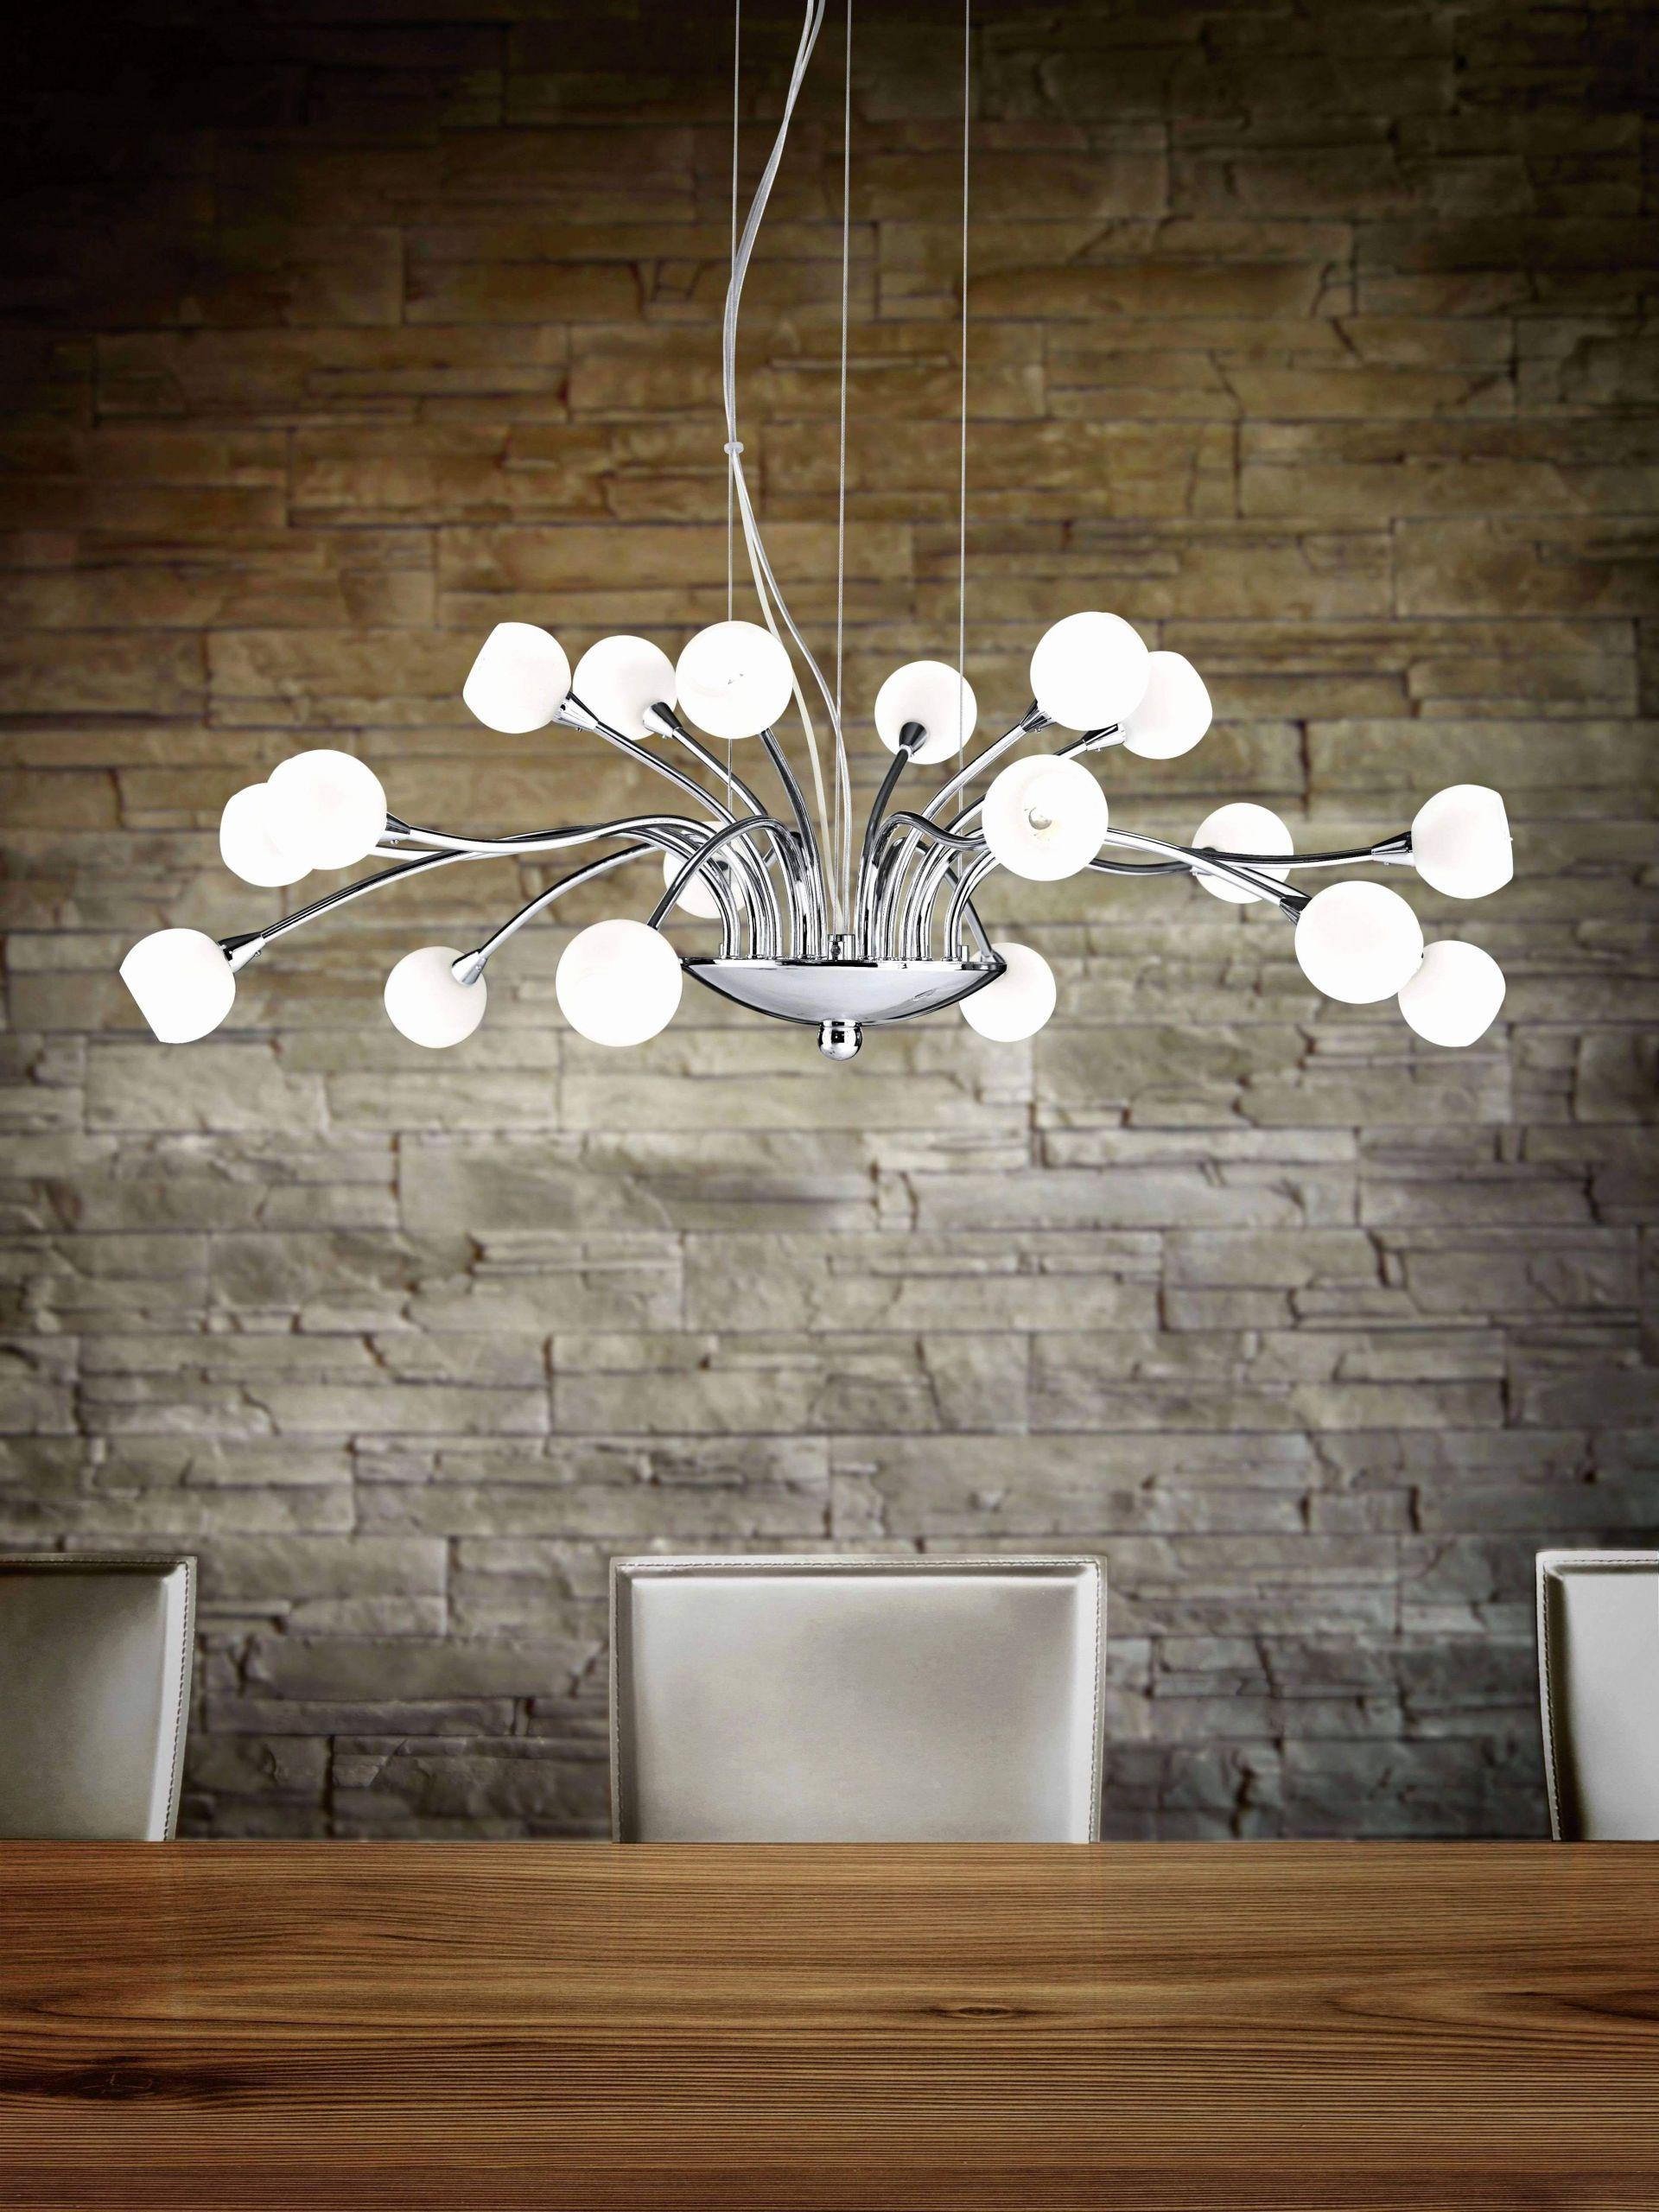 Full Size of Lampe Modern Ventilateur Plafond Moderne Pour Salon Ikea A Poser Sur Pied De Design Meuble 29 Einzigartig Wohnzimmer Elegant Frisch Deckenlampe Bad Wohnzimmer Lampe Modern